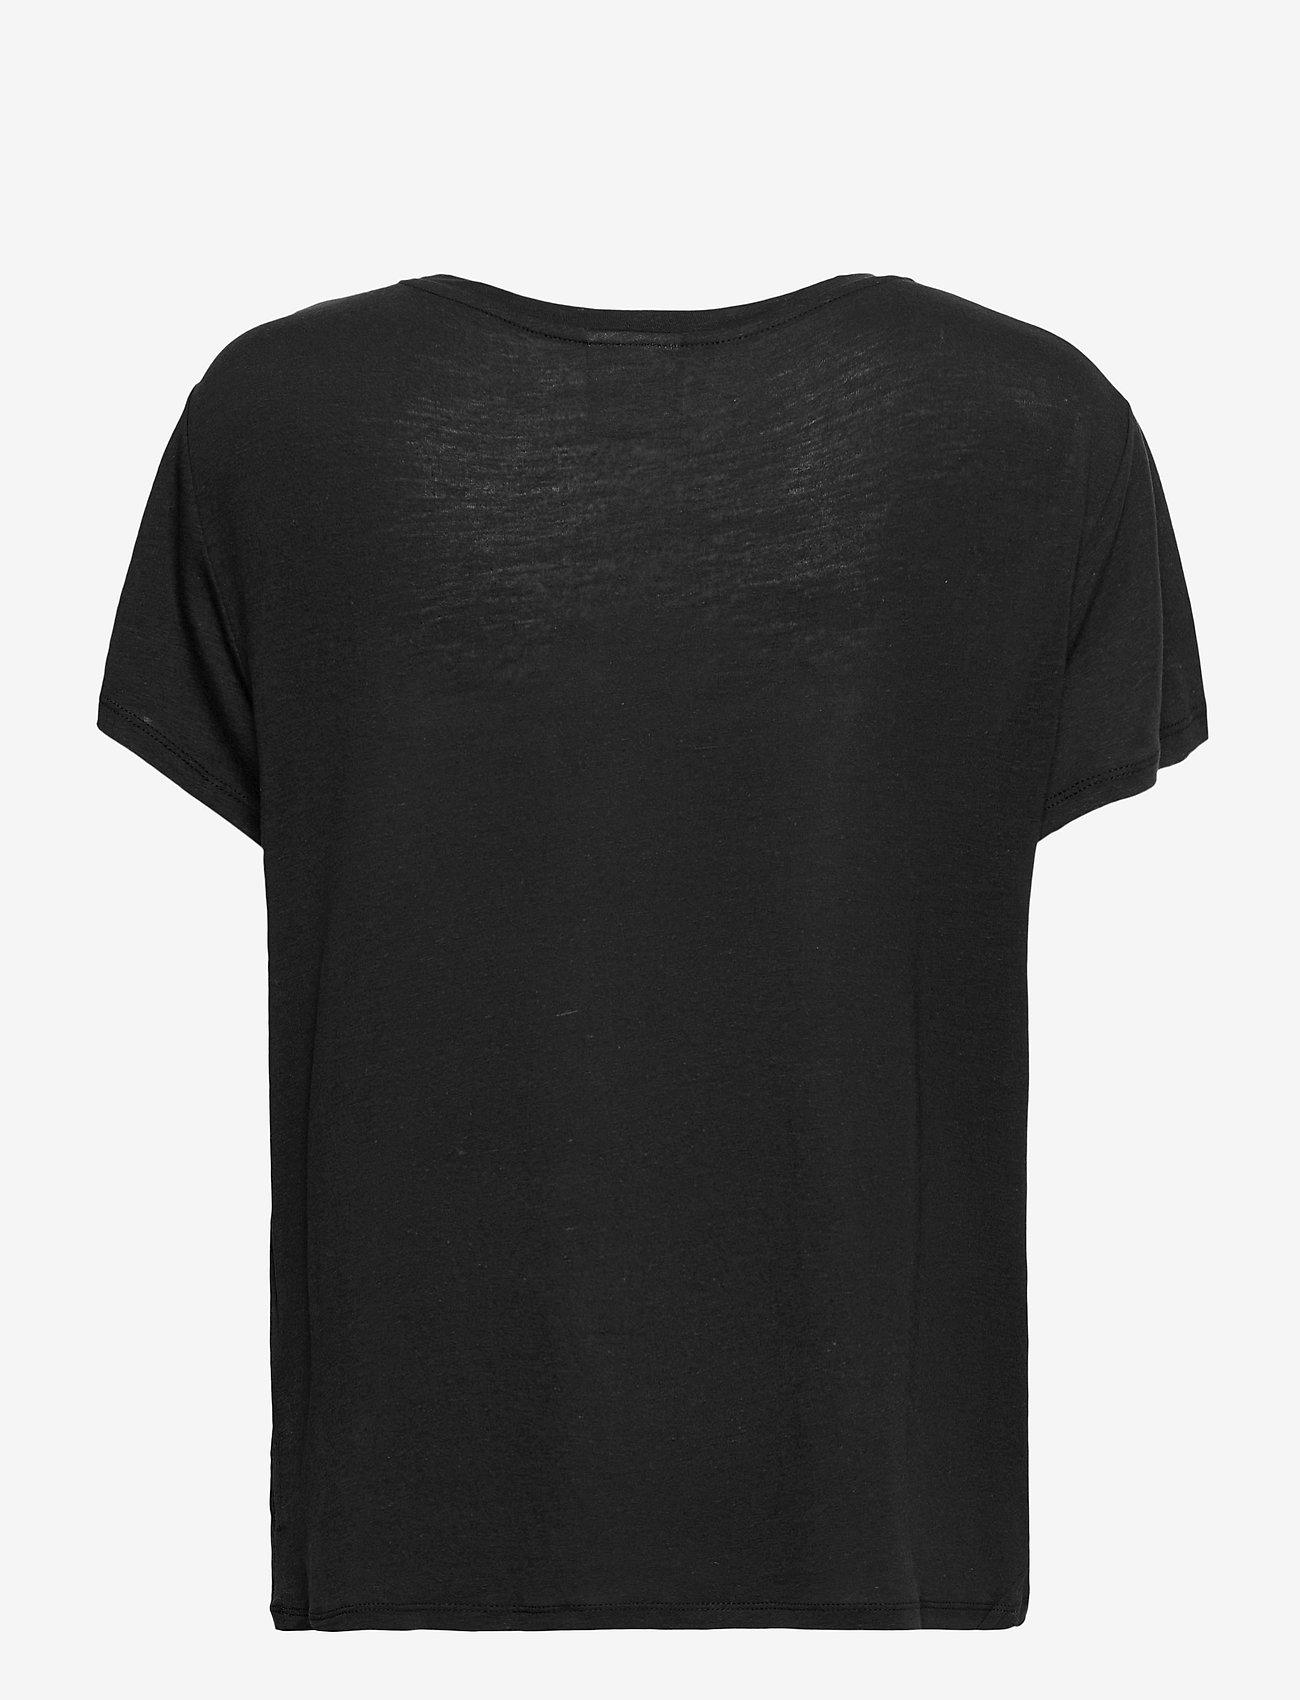 Varley - Tilden Tee 2.0 - t-shirts - black - 1